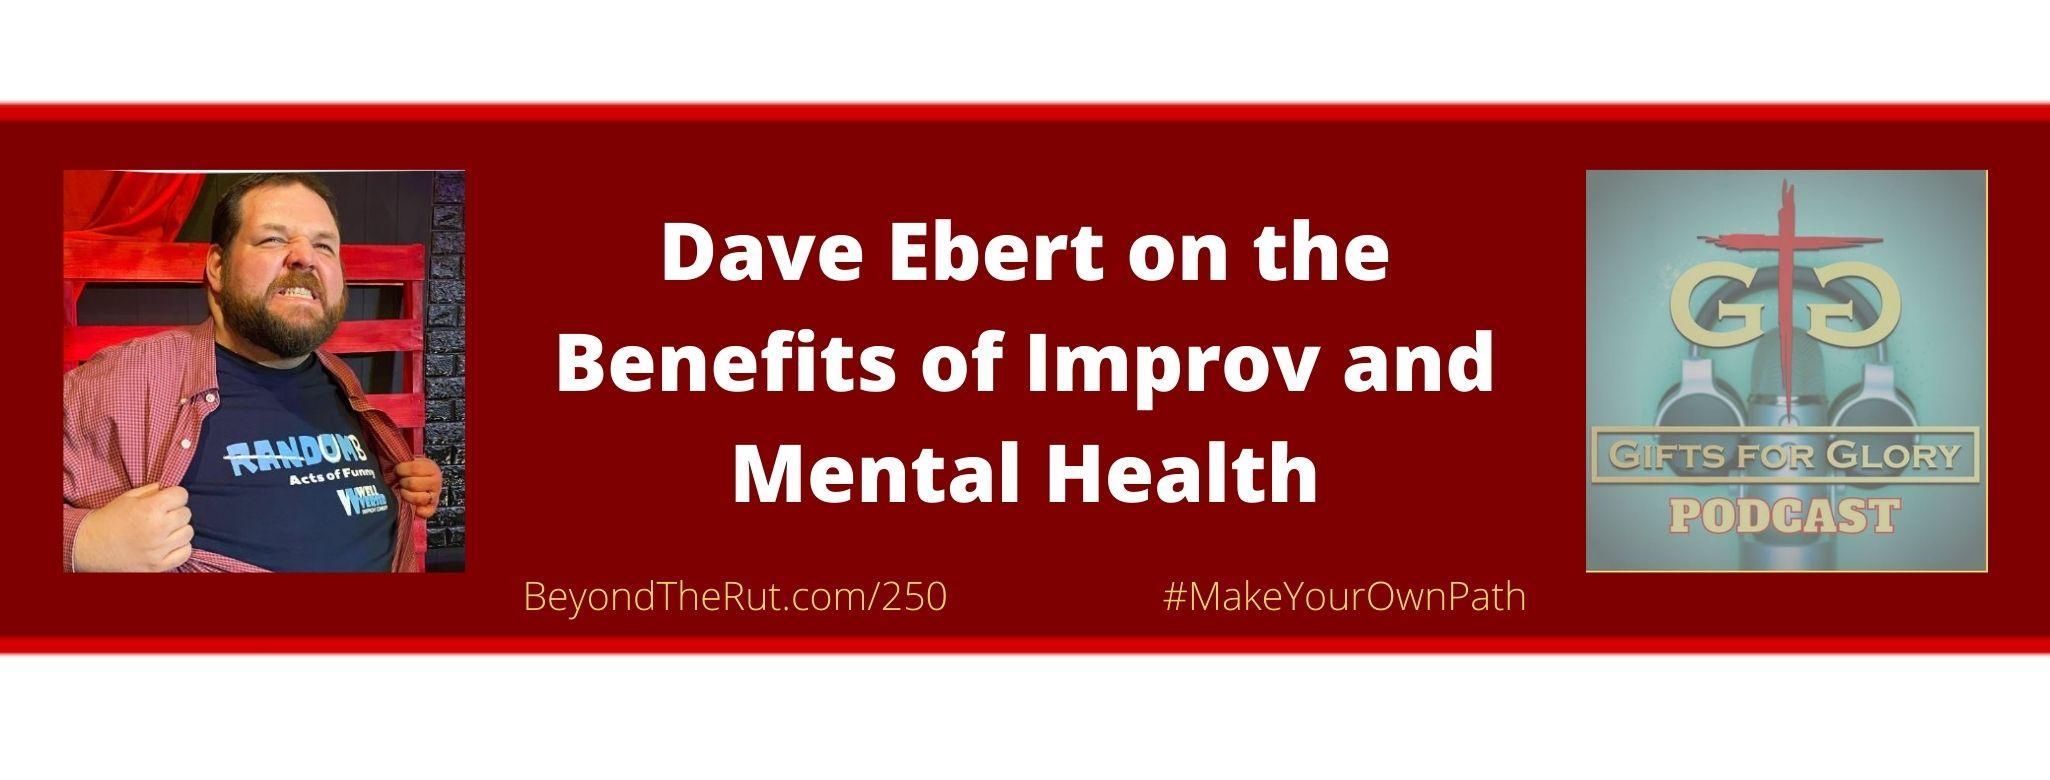 benefits of improv